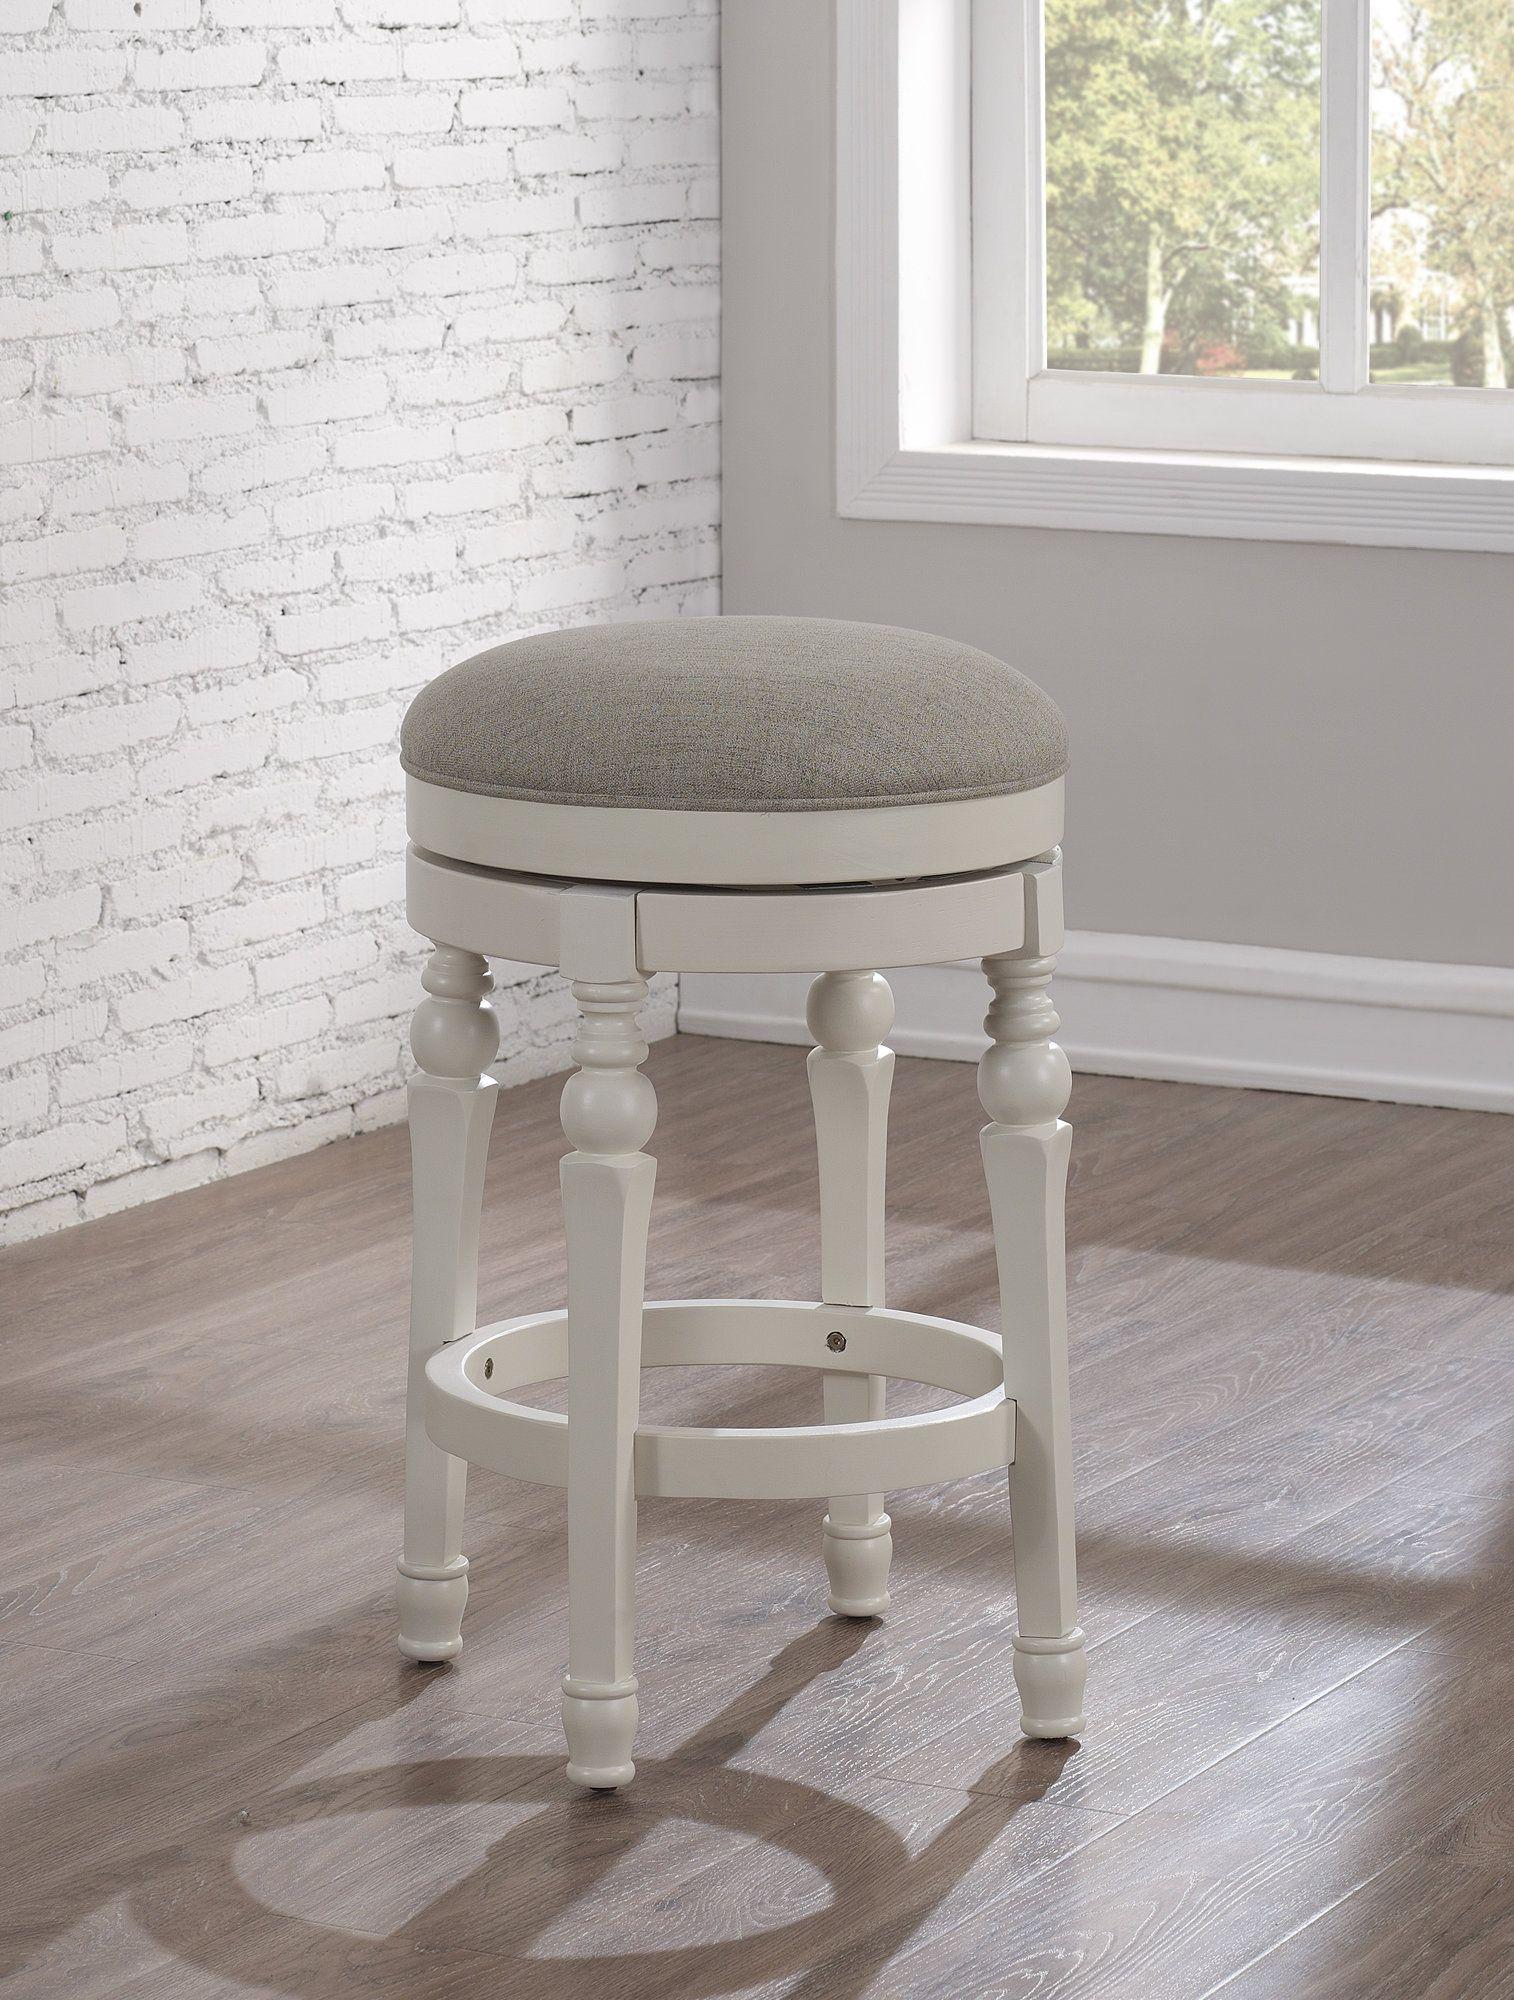 Caulders 26 swivel bar stool with cushion